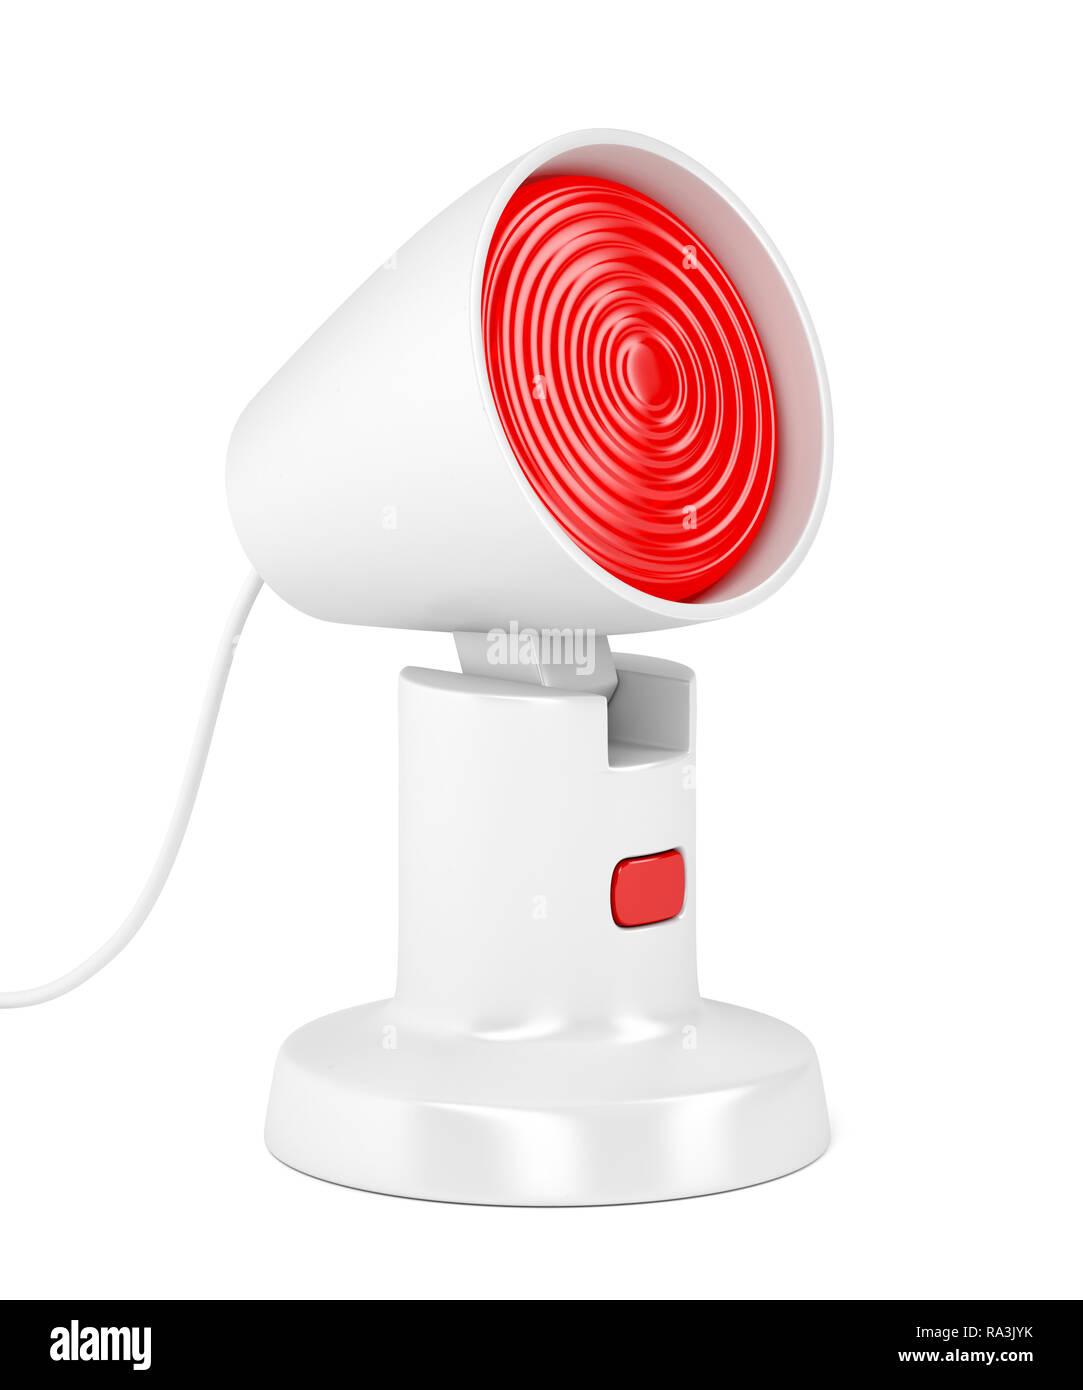 Medical infrared lamp on white background - Stock Image